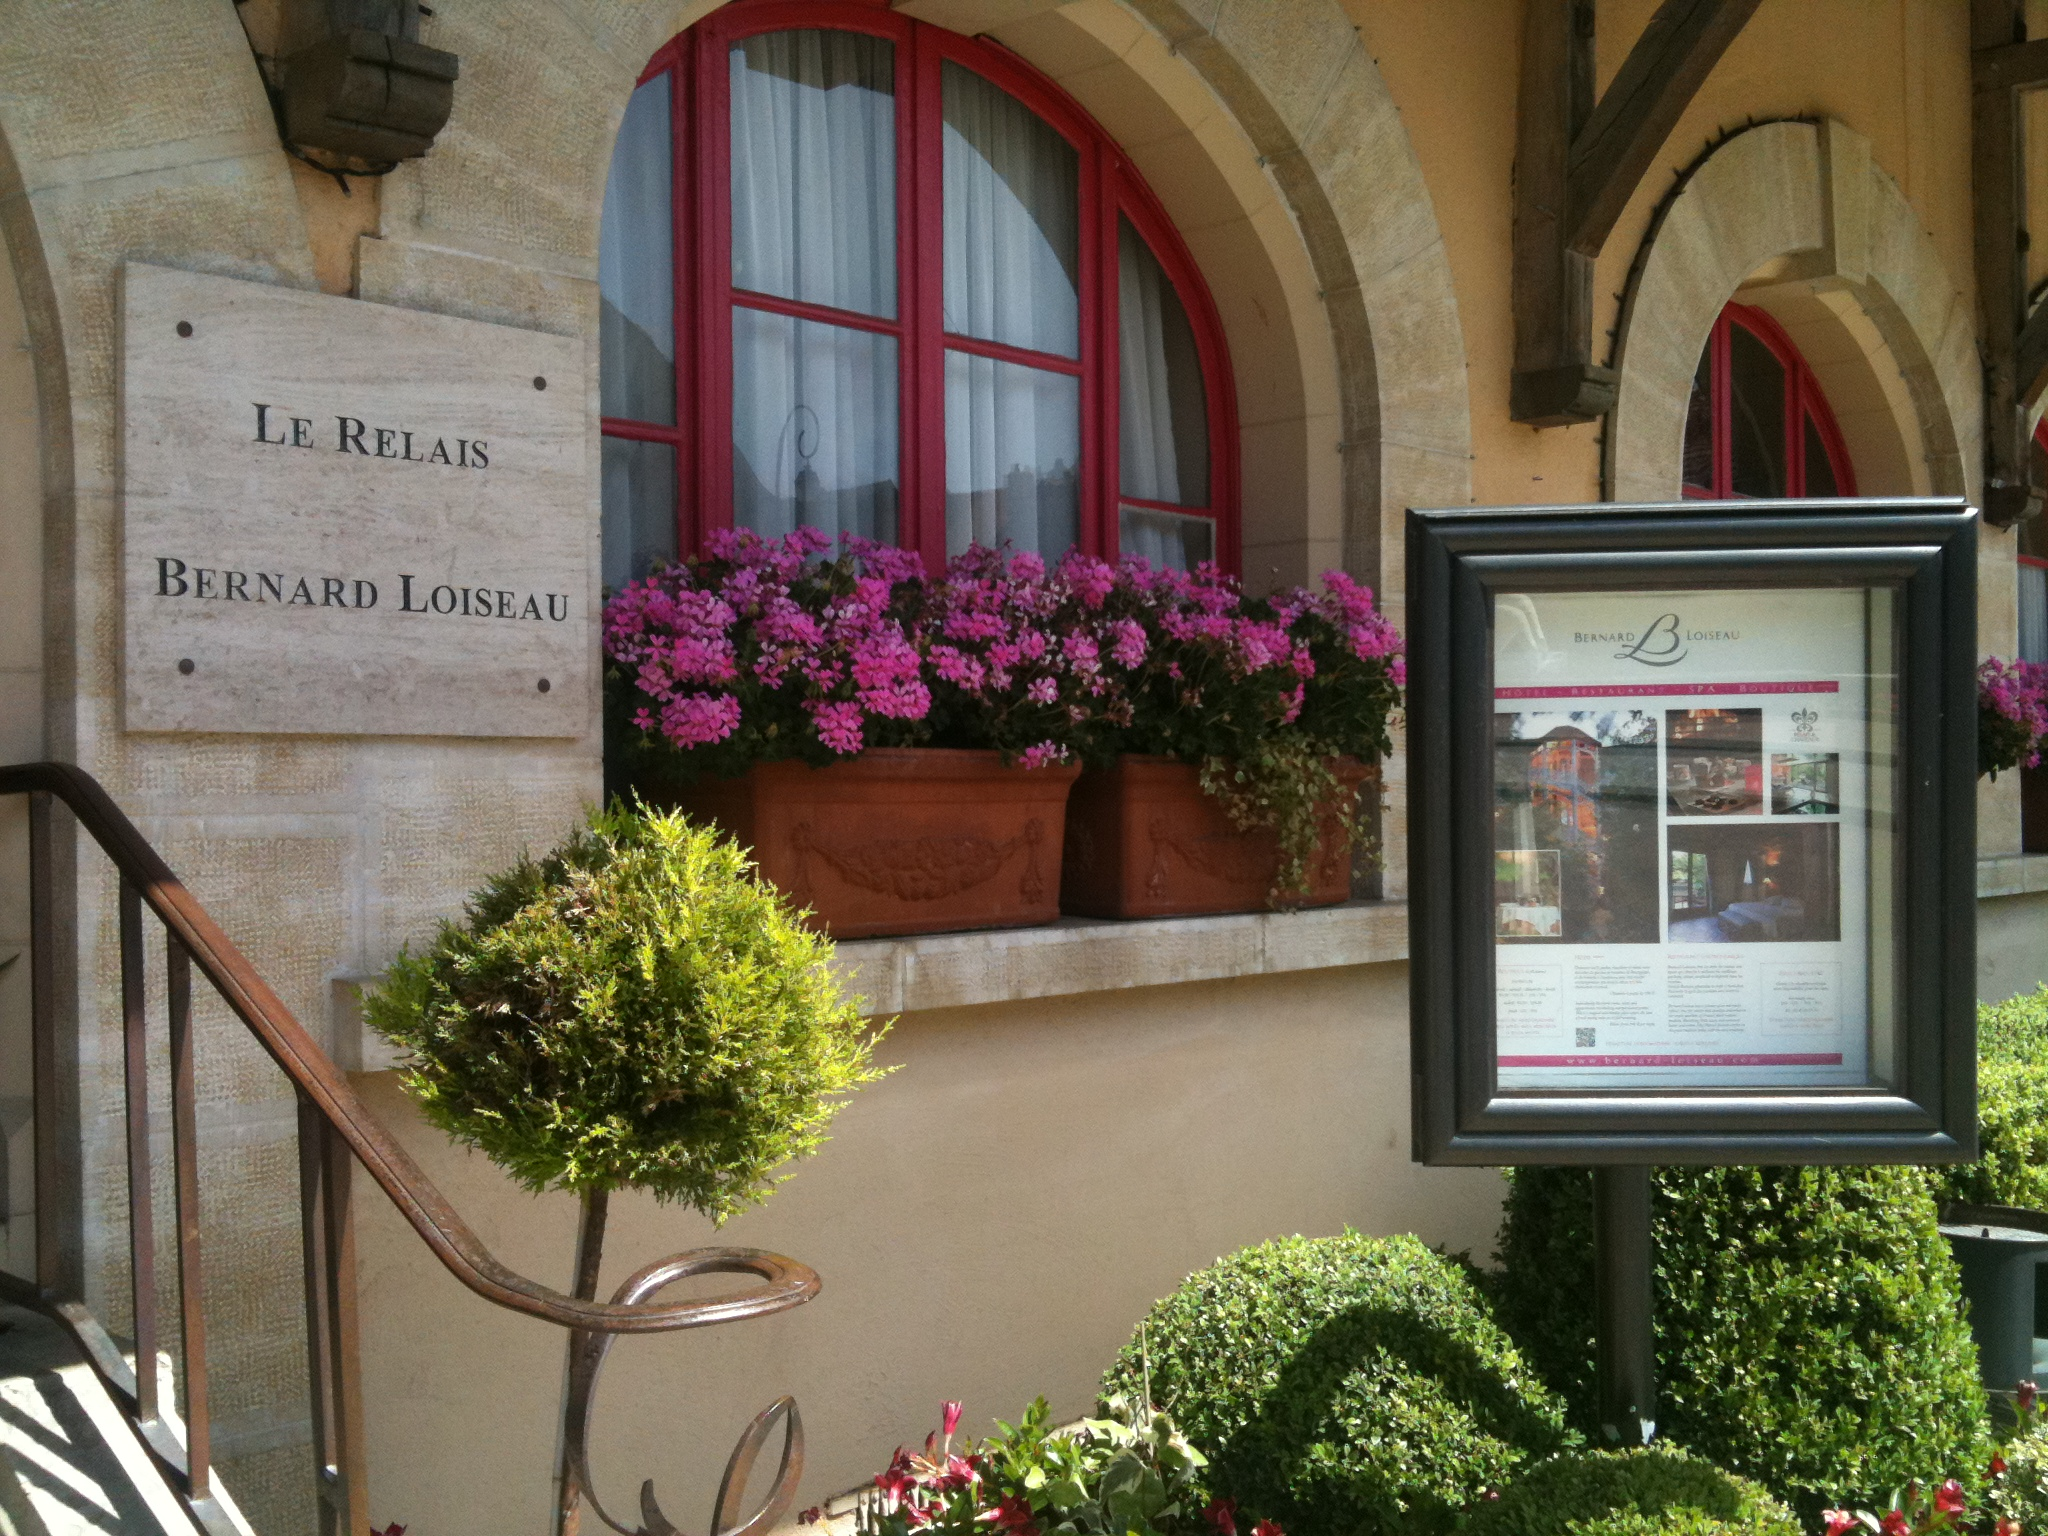 Restaurant Bernard Loiseau, Seaulieu